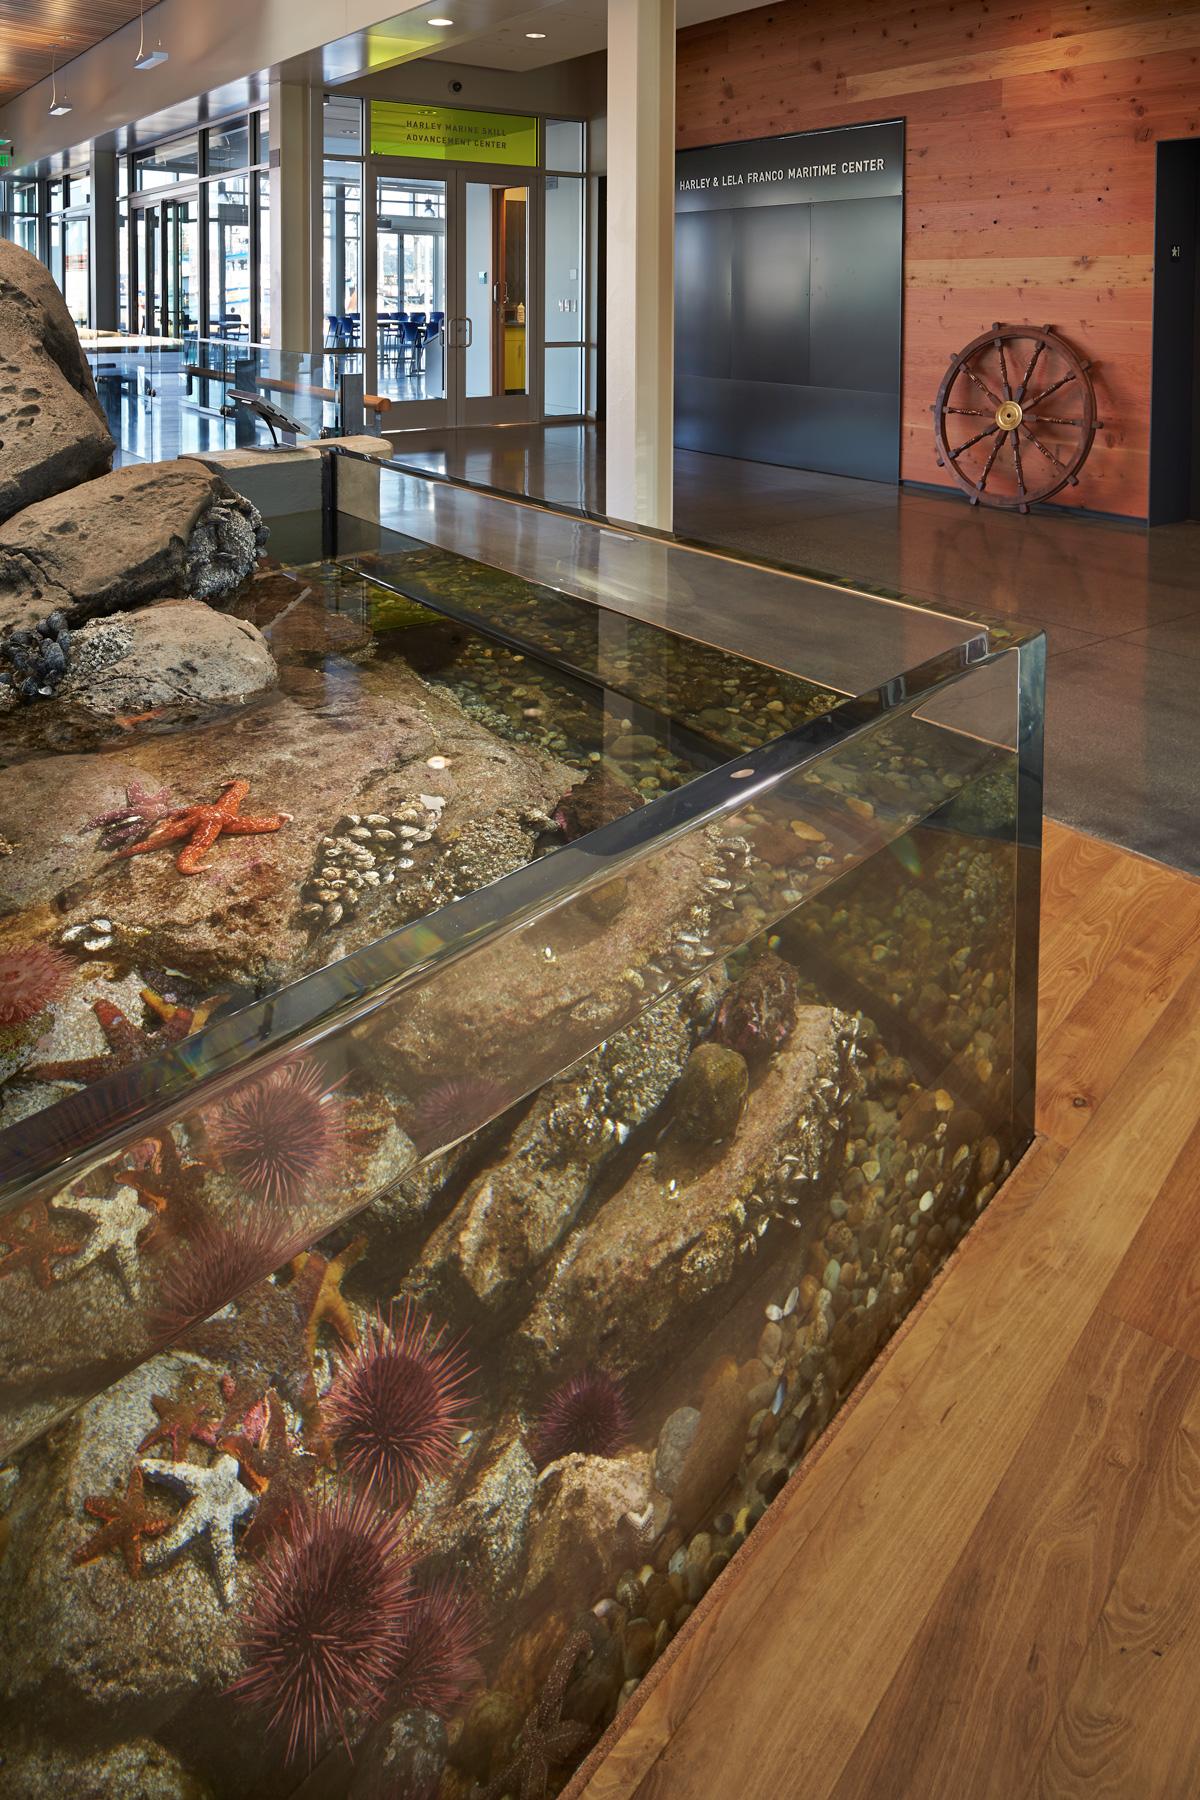 Harley and Lela Franco Maritime Center Lobby and Aquarium Tank